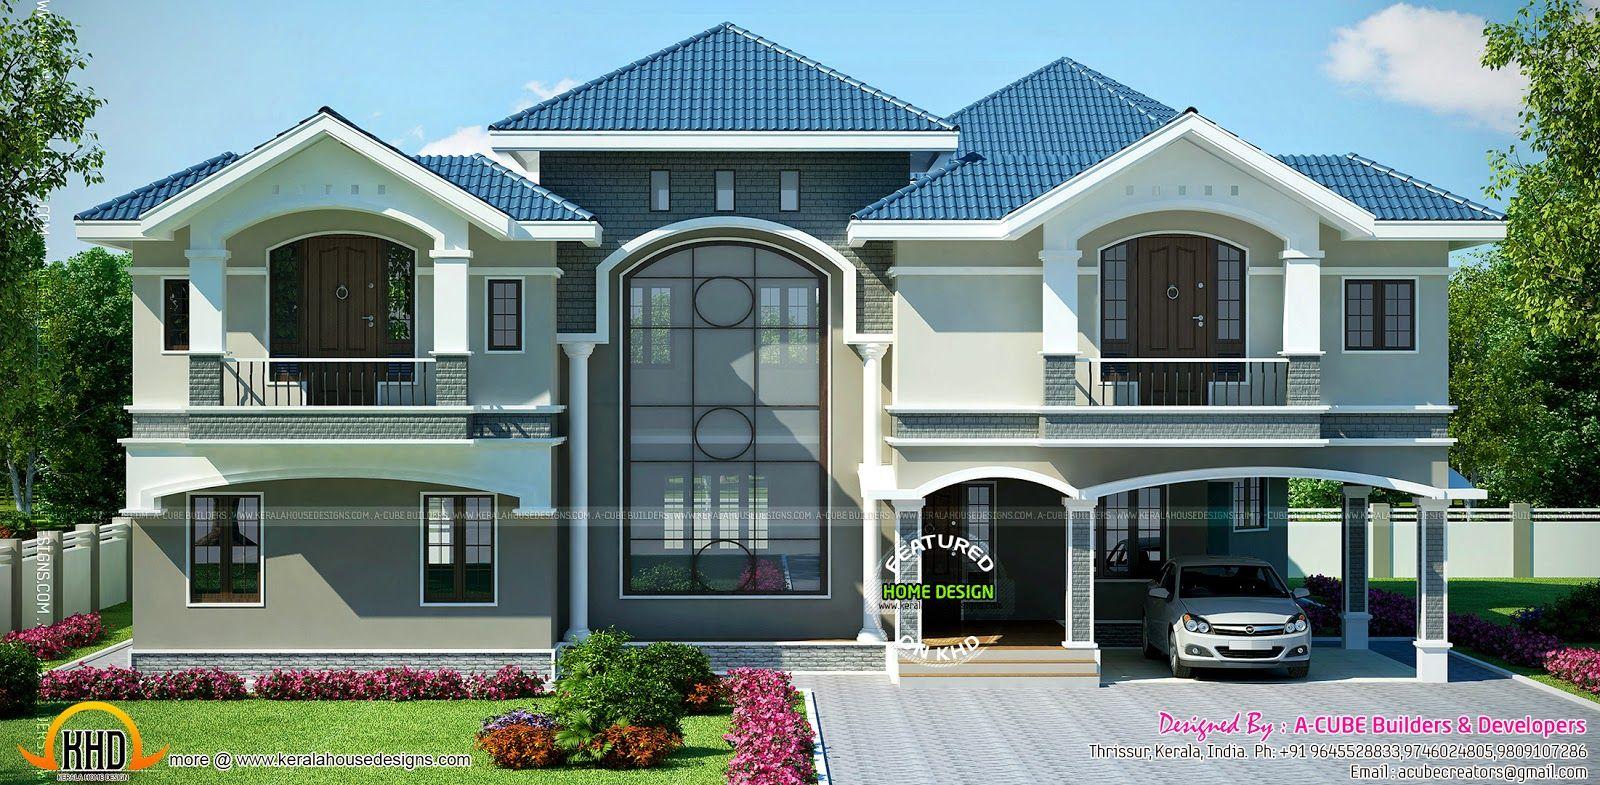 Best Home Designer.com Ideas - Interior Design Ideas ...